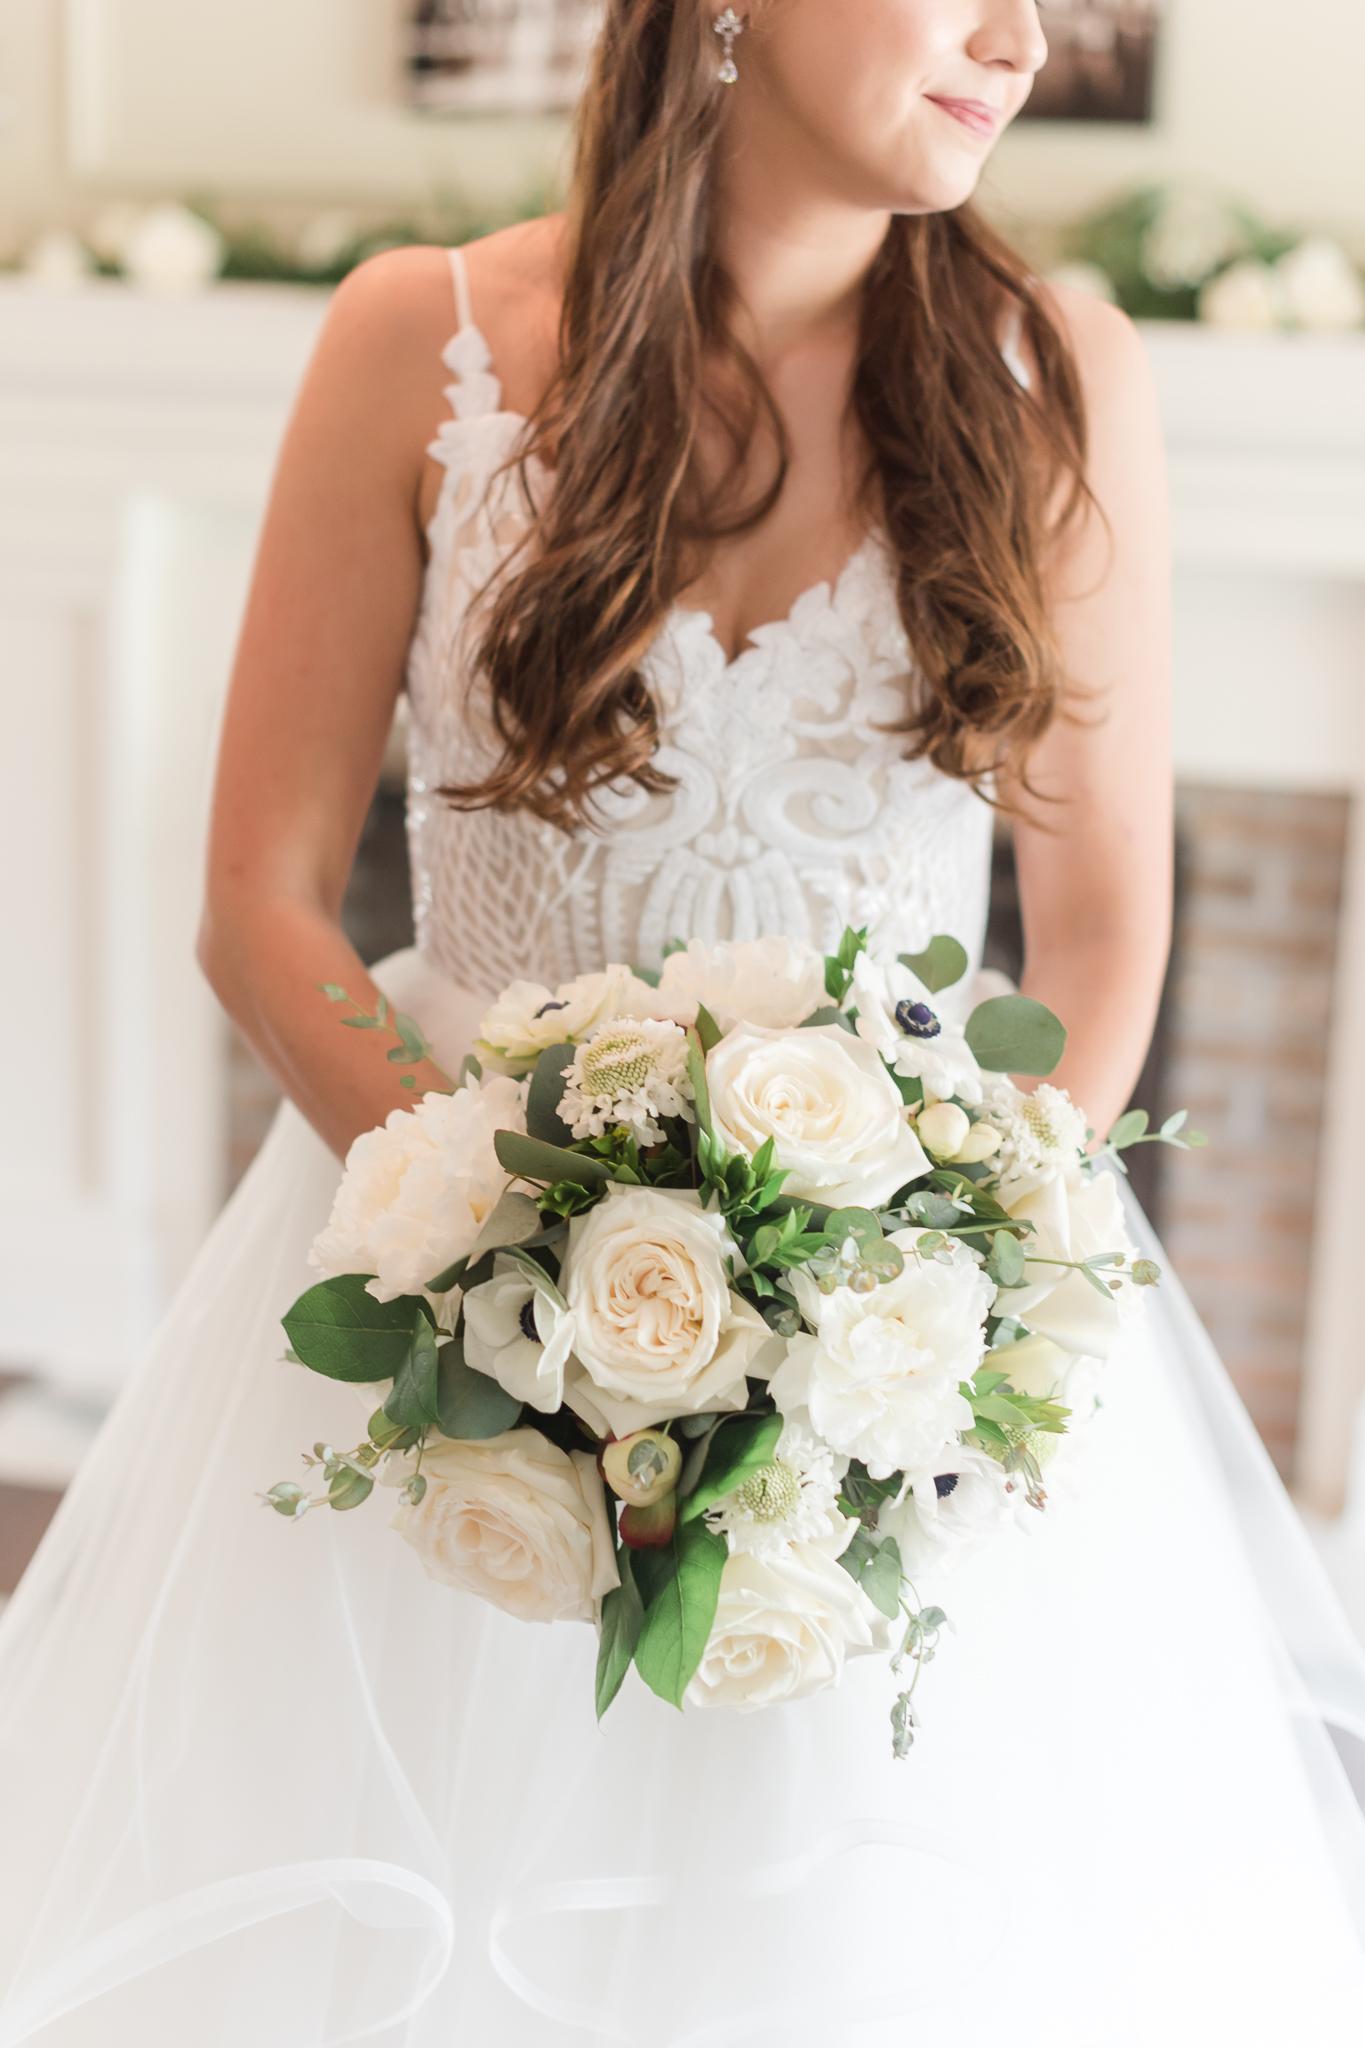 Black Iris Estate Wedding Elegant White with Greenery Luxury High End Flowers-8.jpg